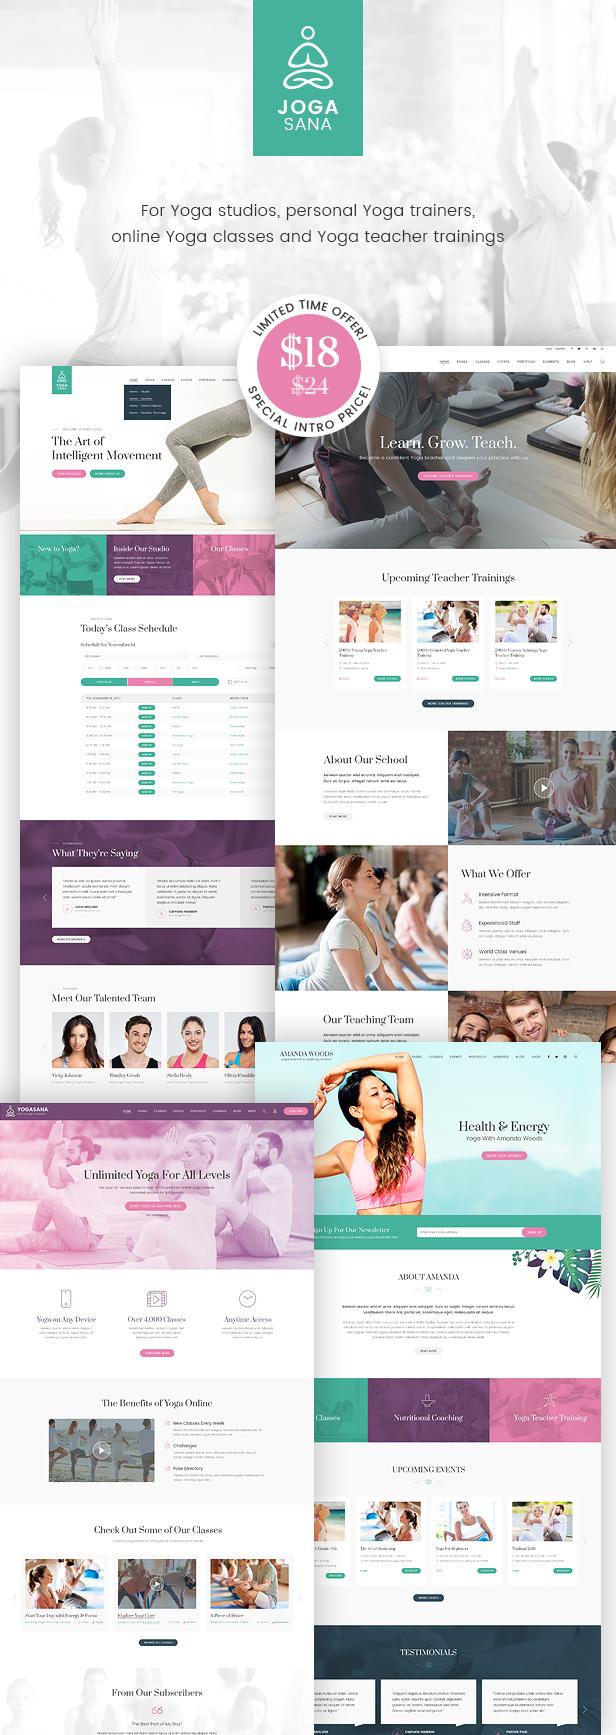 jogasana yoga oriented website template by monkeysan themeforest